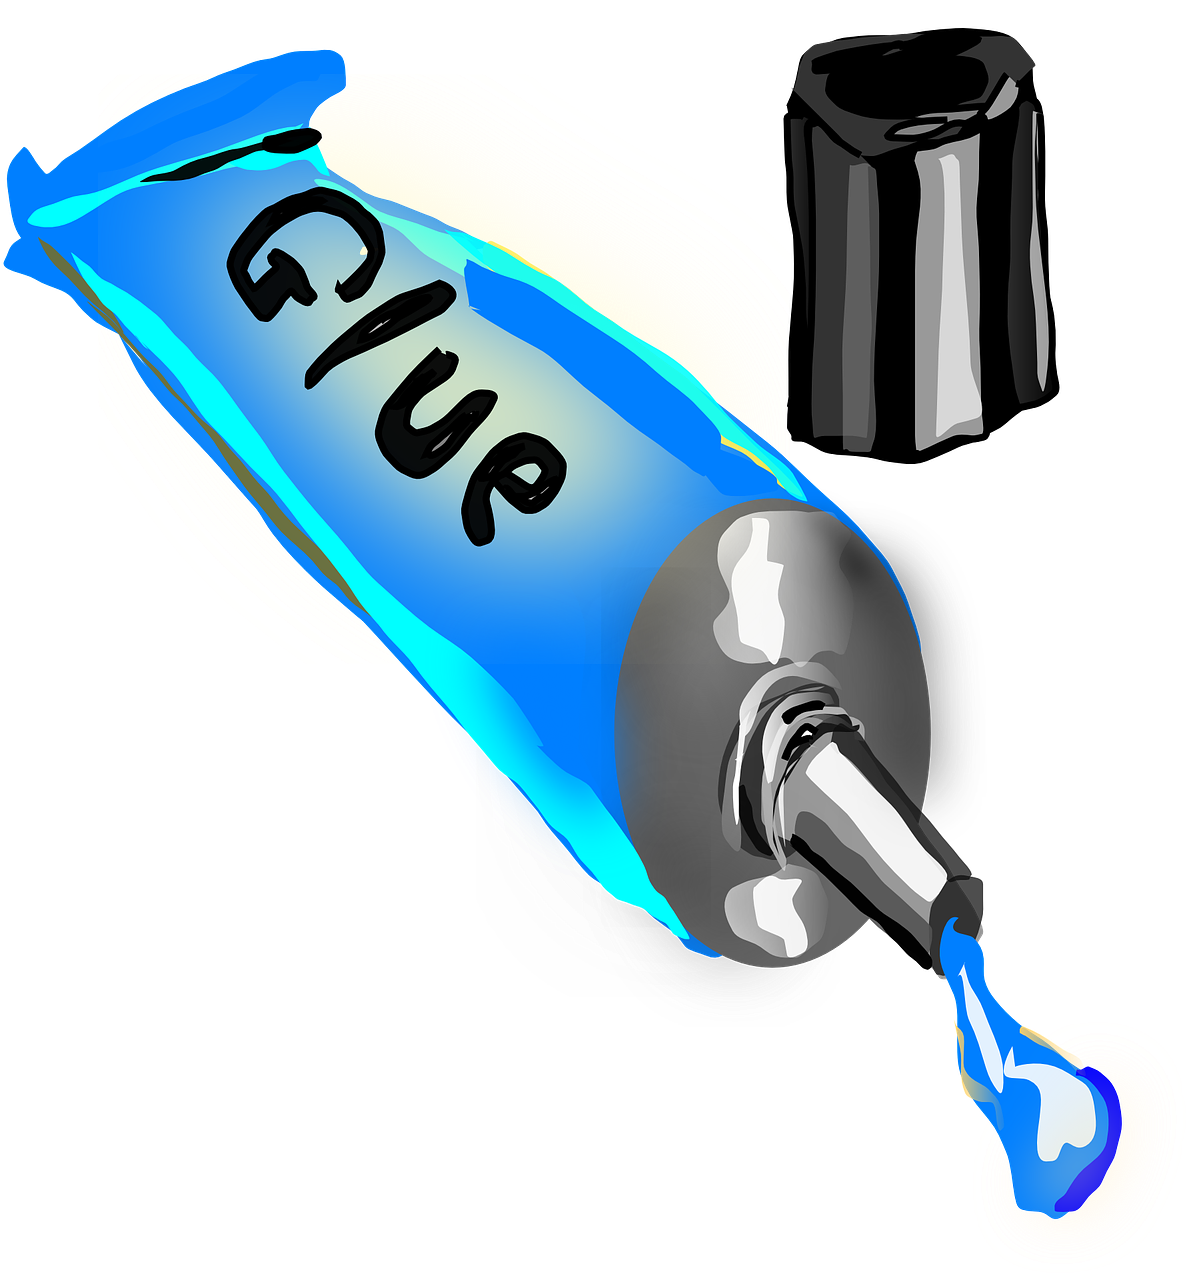 UVレジンを接着剤として代用できる?瞬間接着剤やボンドとの強度について